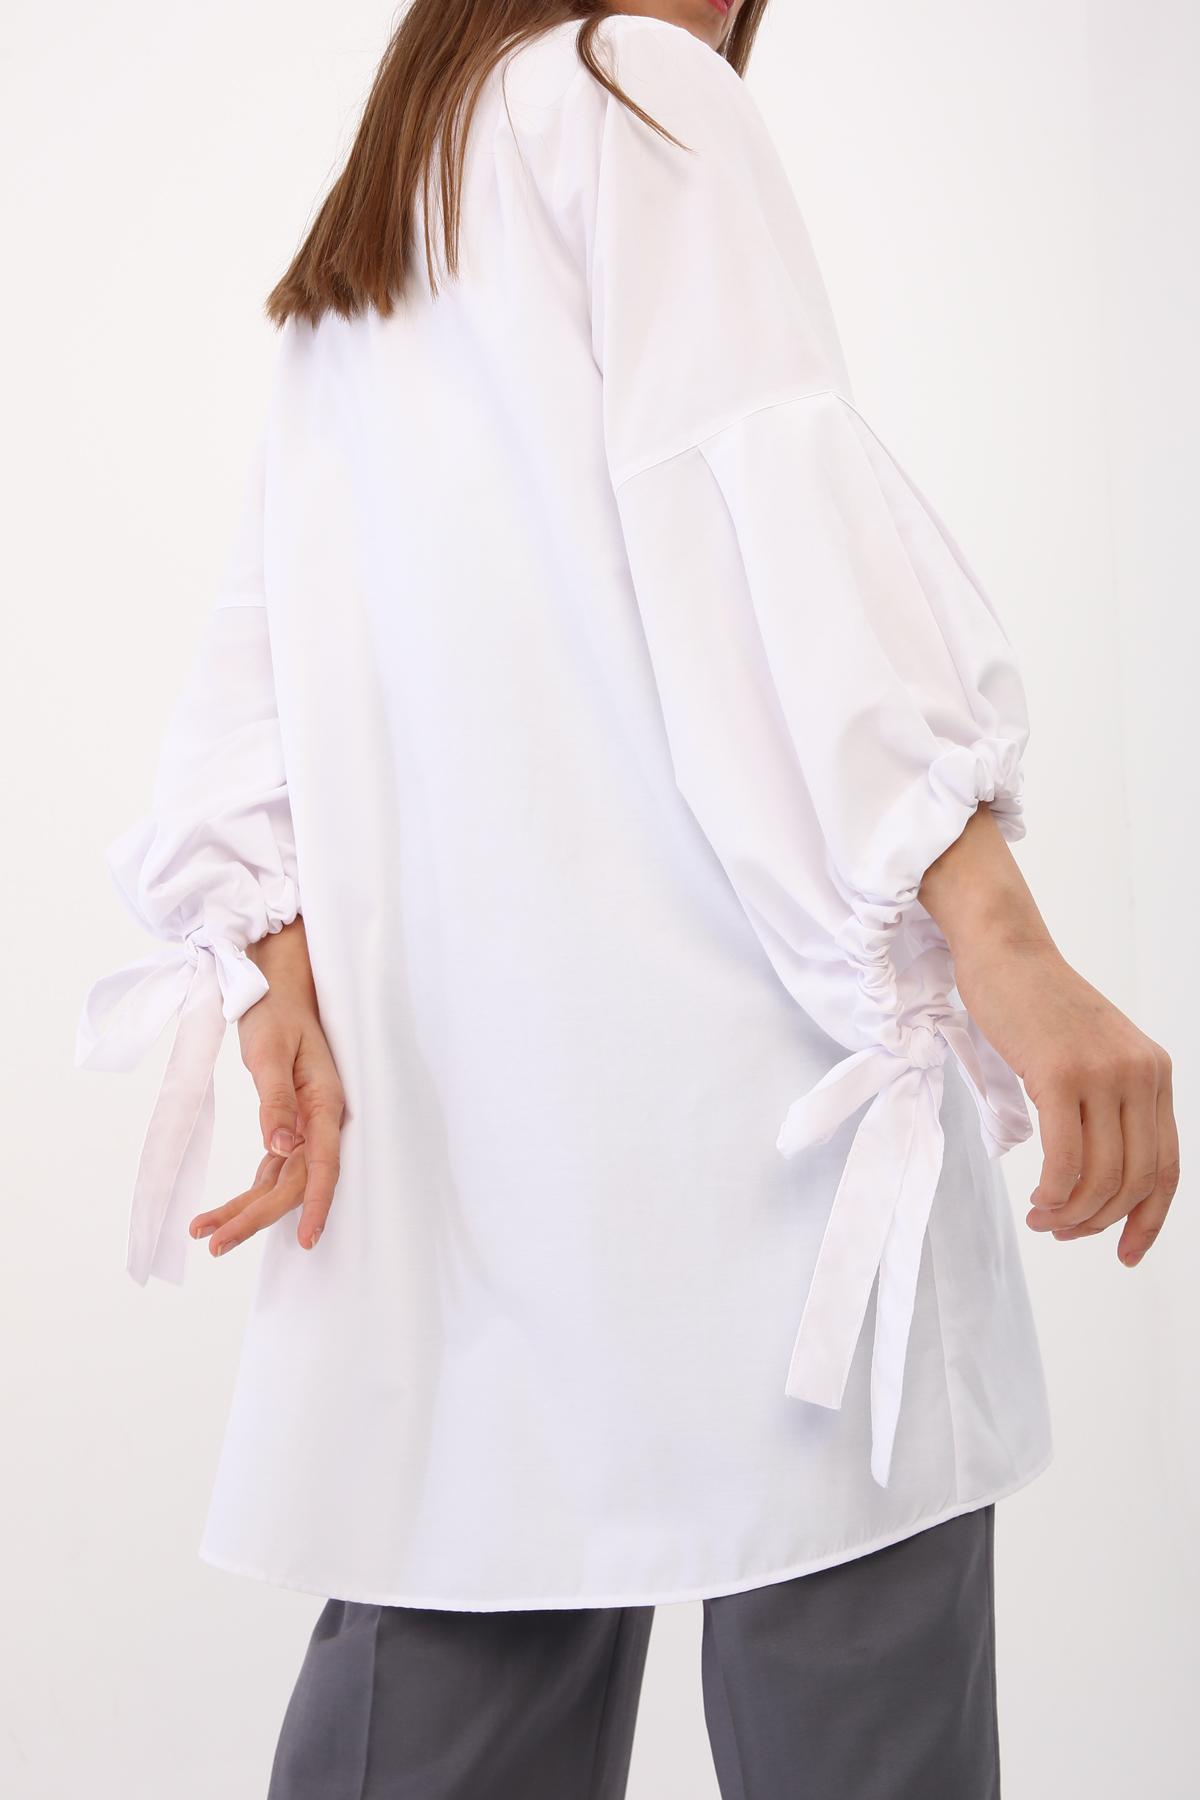 Kimono Detailed Sleeve Long Shirt